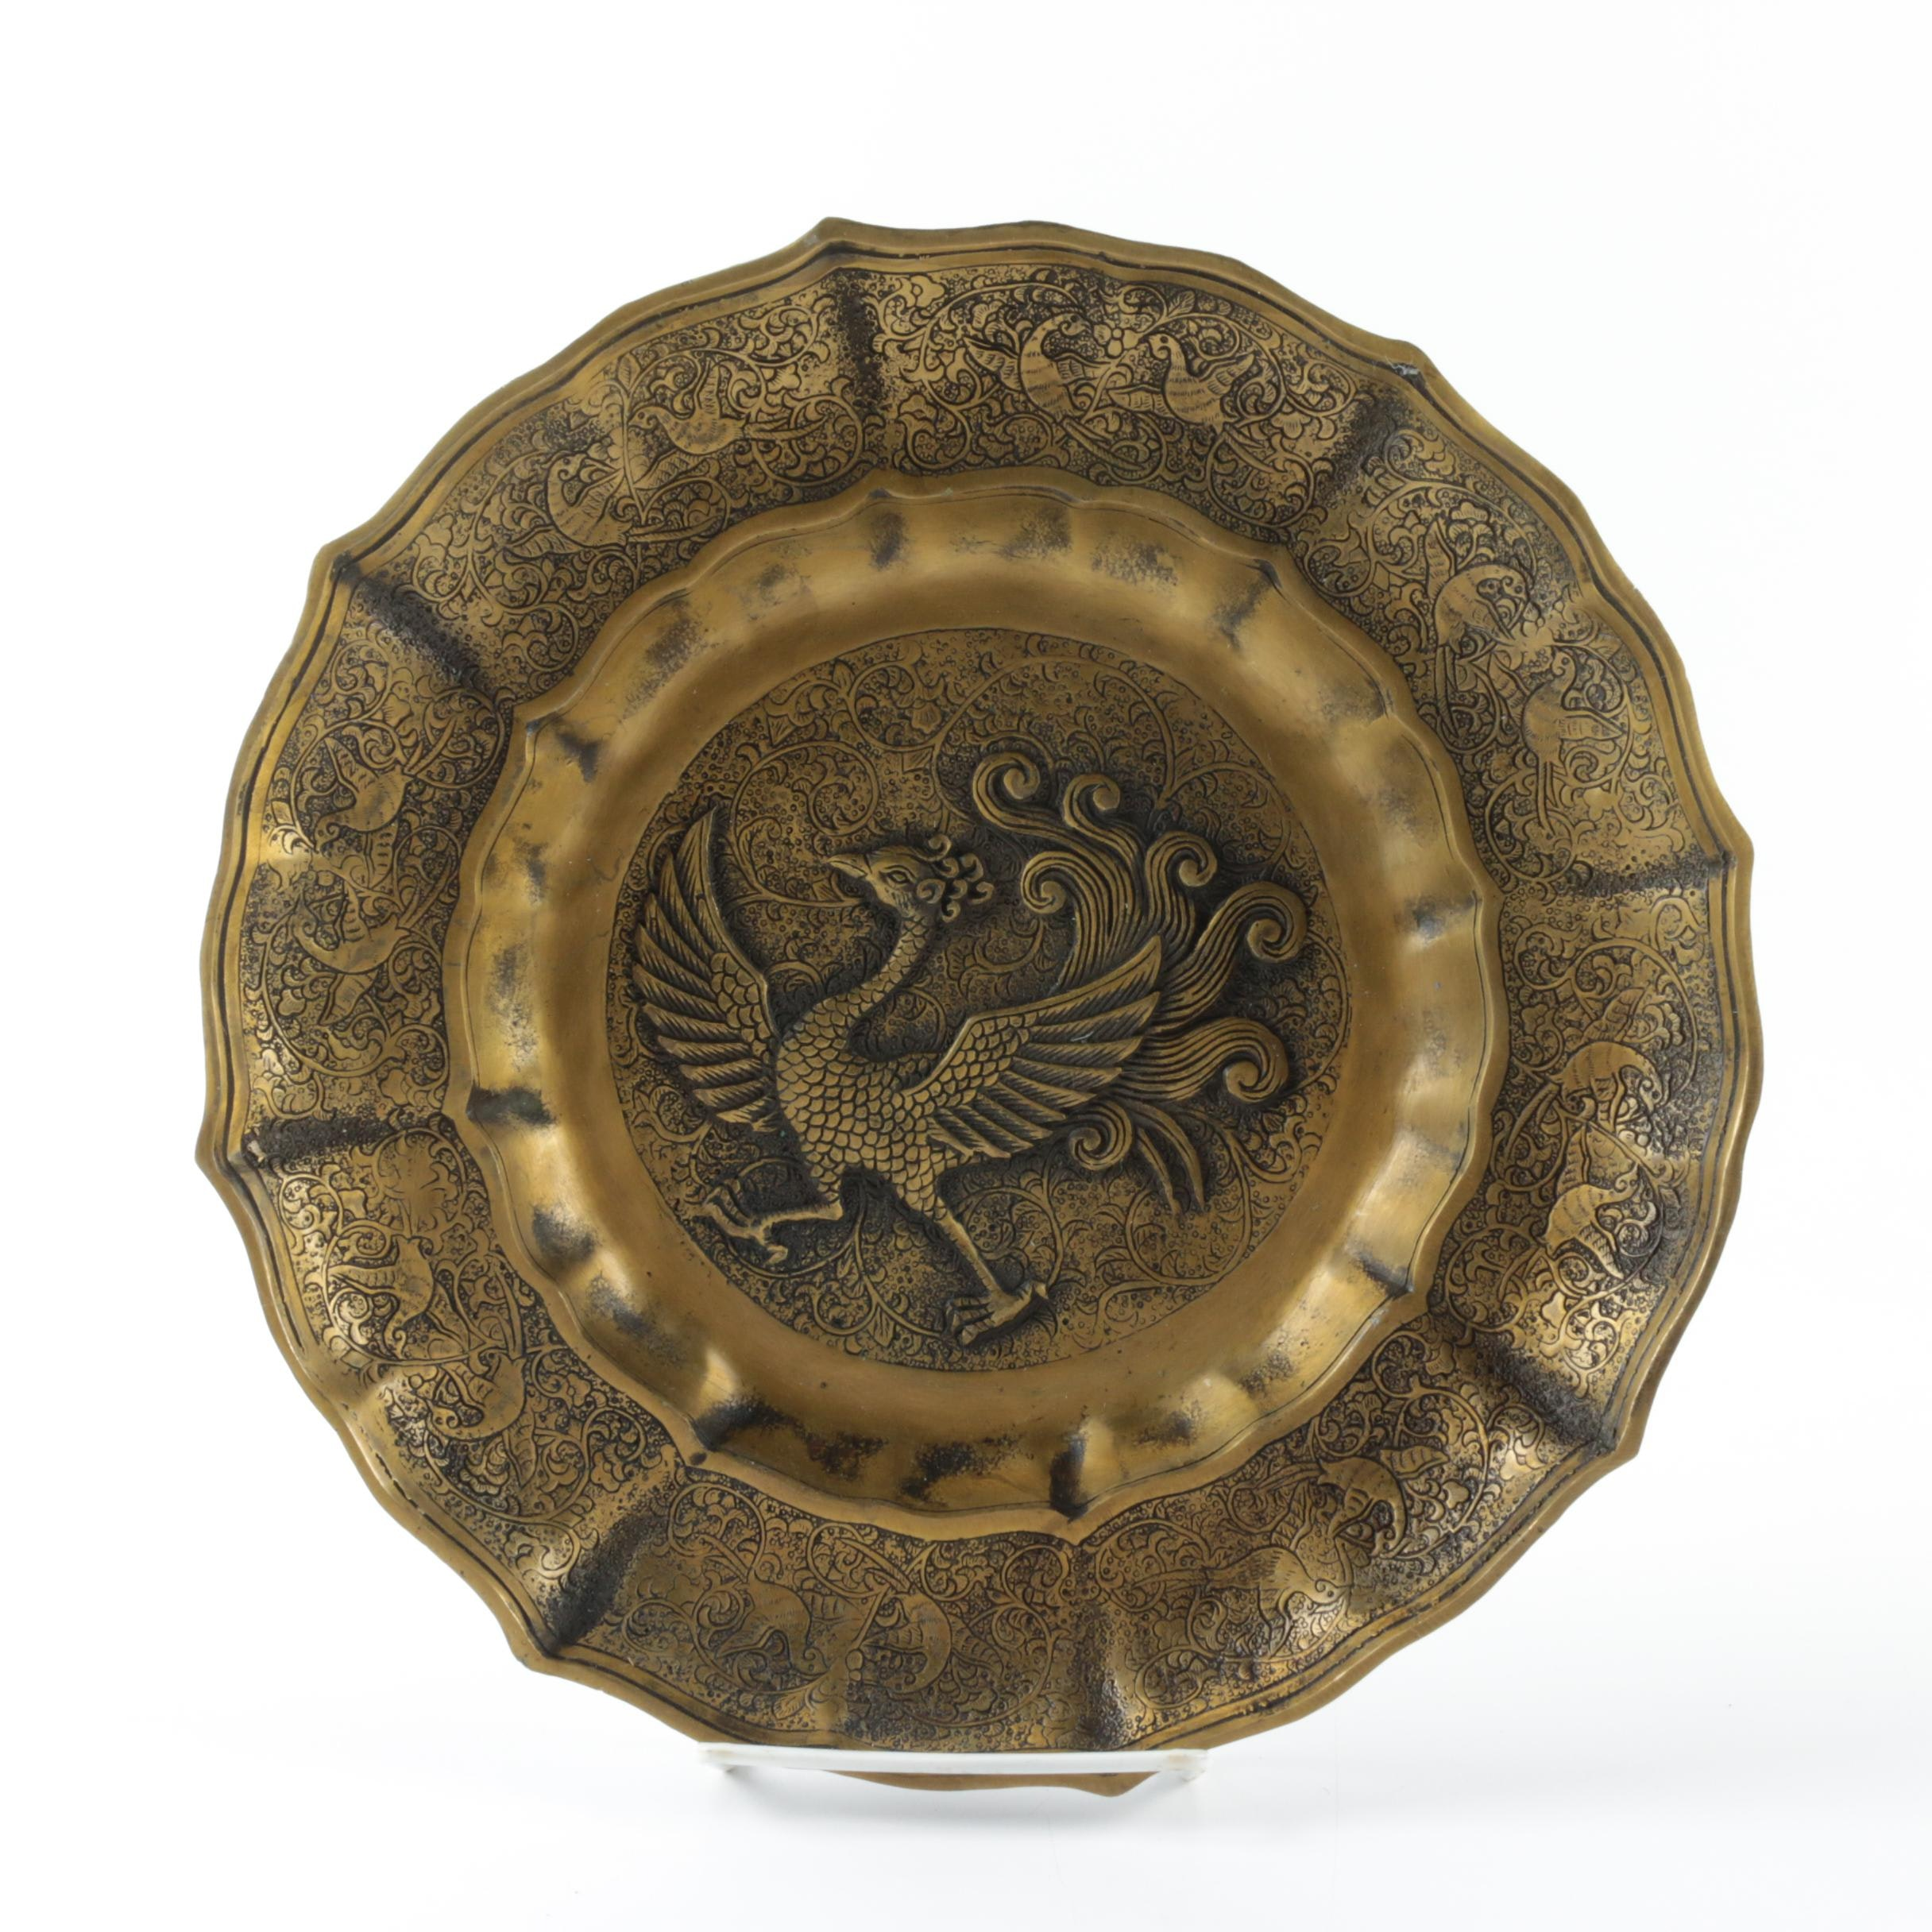 Chinese Metal Bowl with Phoenix Motif